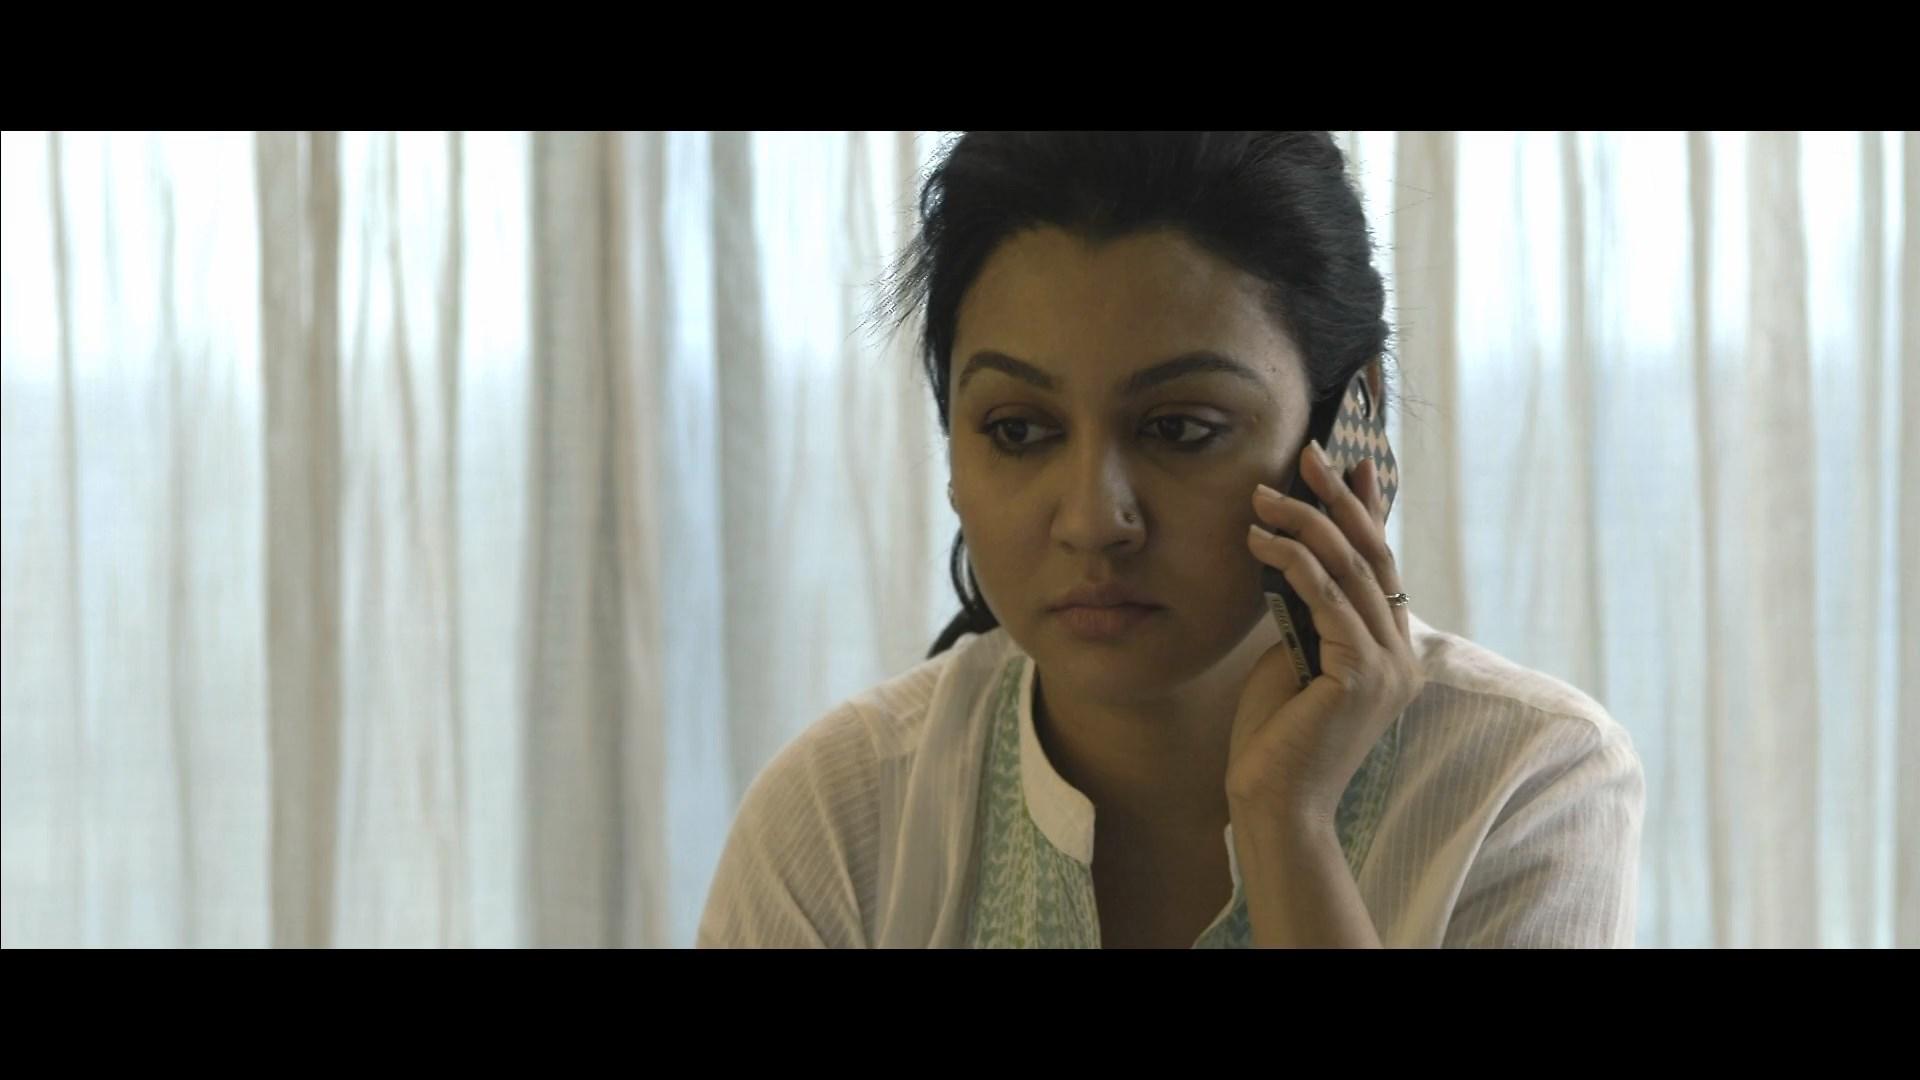 Ekti Bangali Bhooter Goppo 2021 Bengali 1080p WEB DL x264.mkv snapshot 00.26.46.000